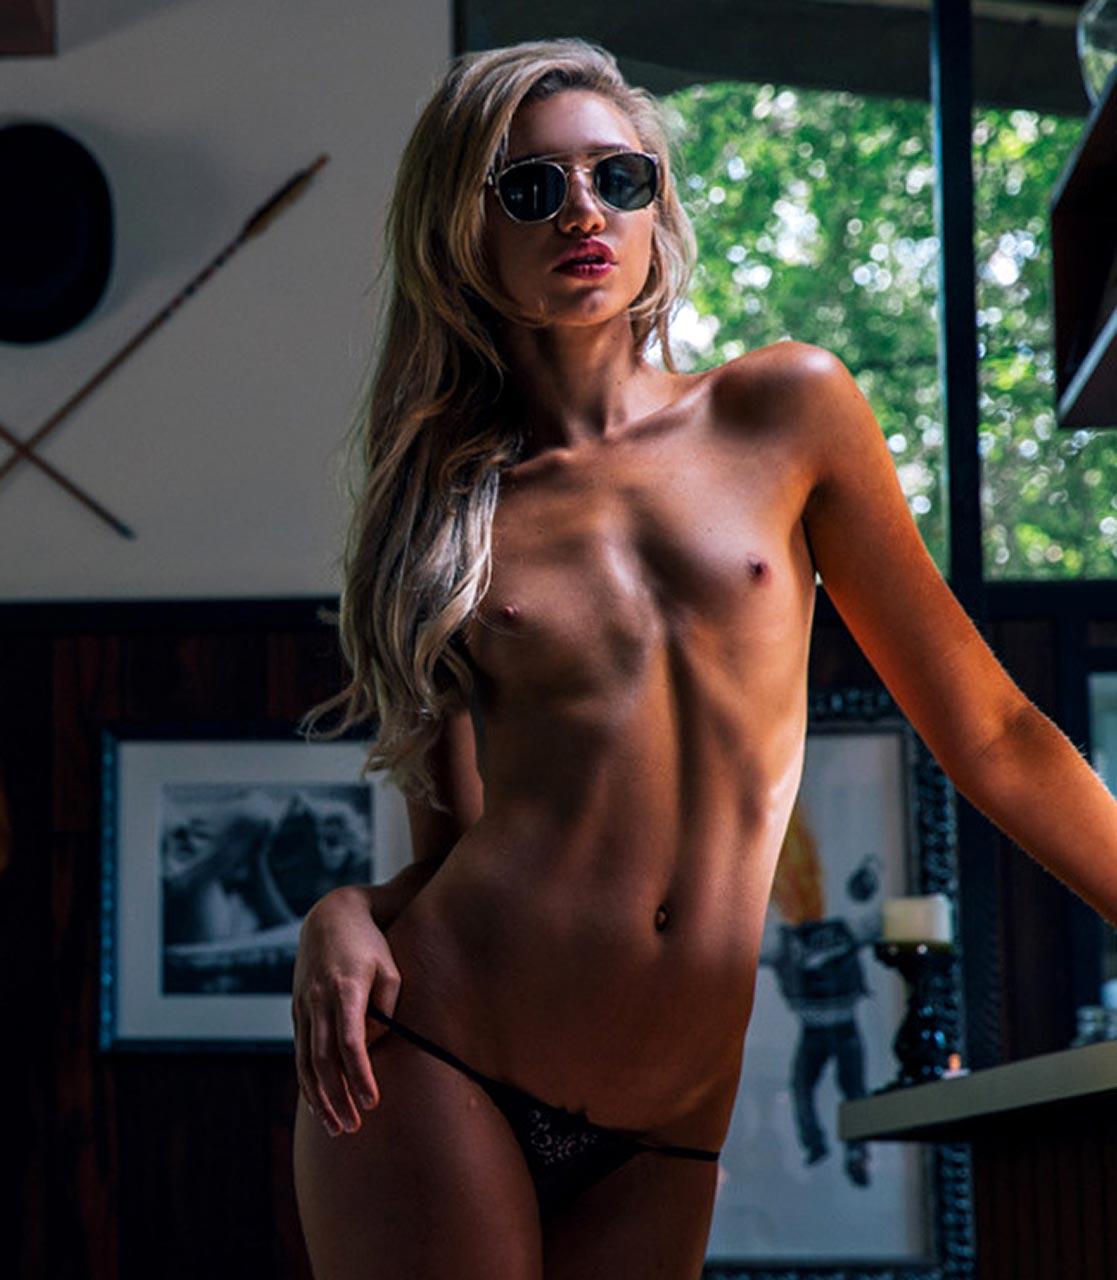 Pamela anderson on nude beach